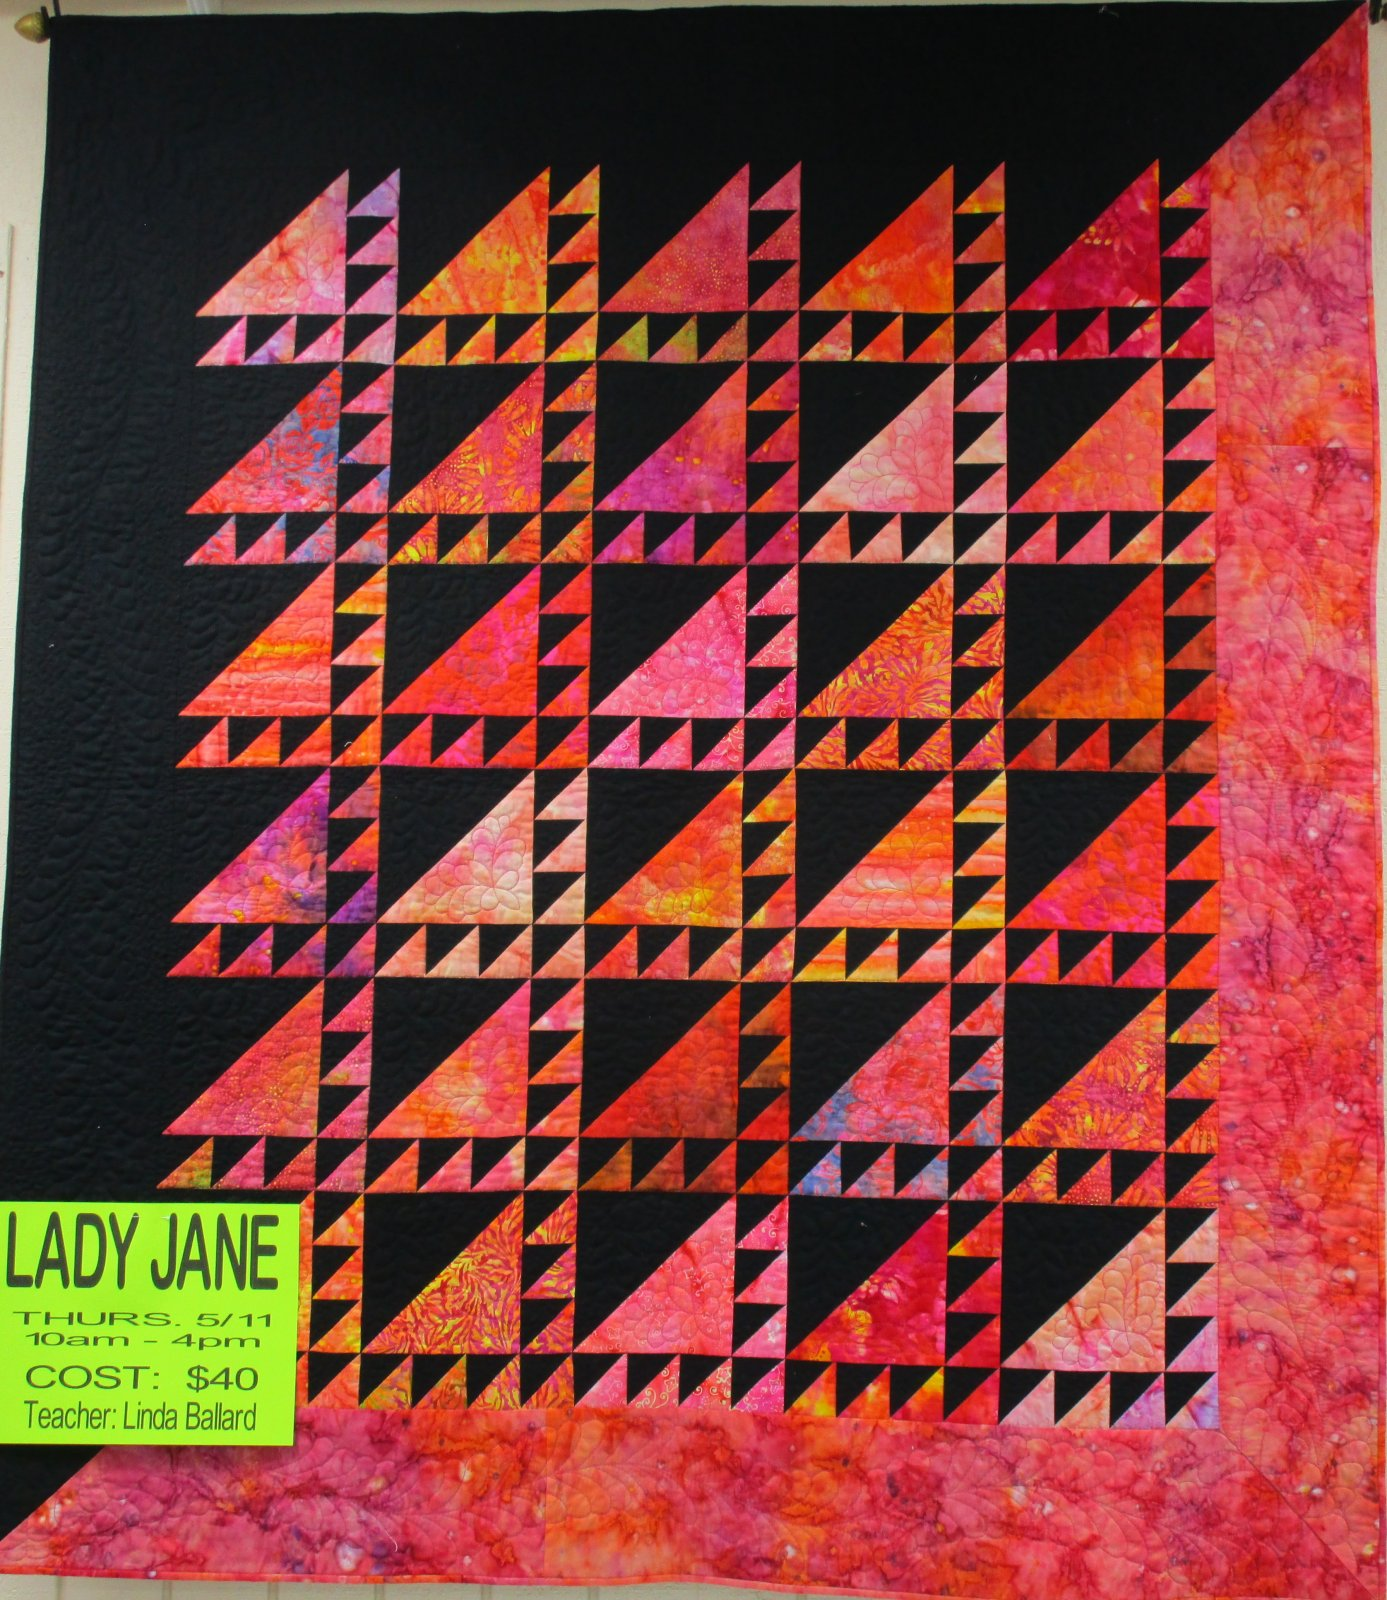 lady jane with linda ballard